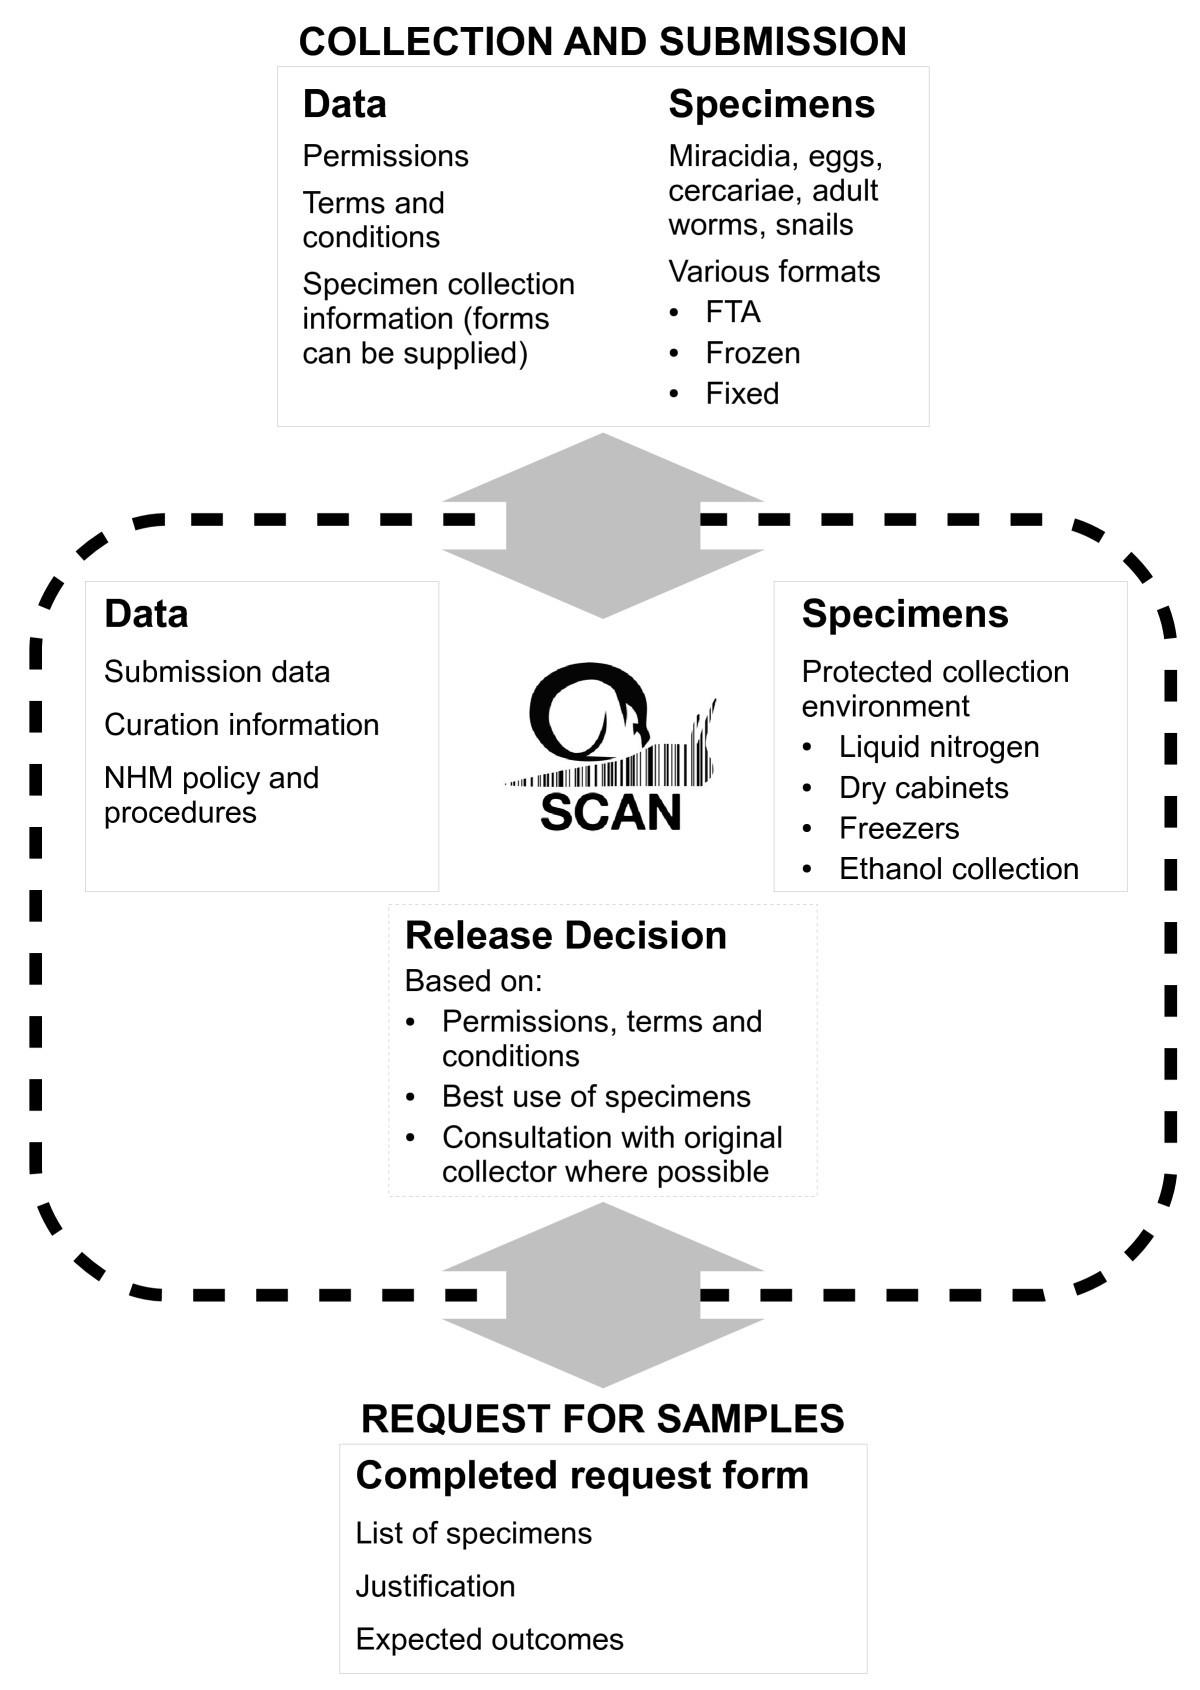 schistosomiasis collection at nhm scan parasites vectors